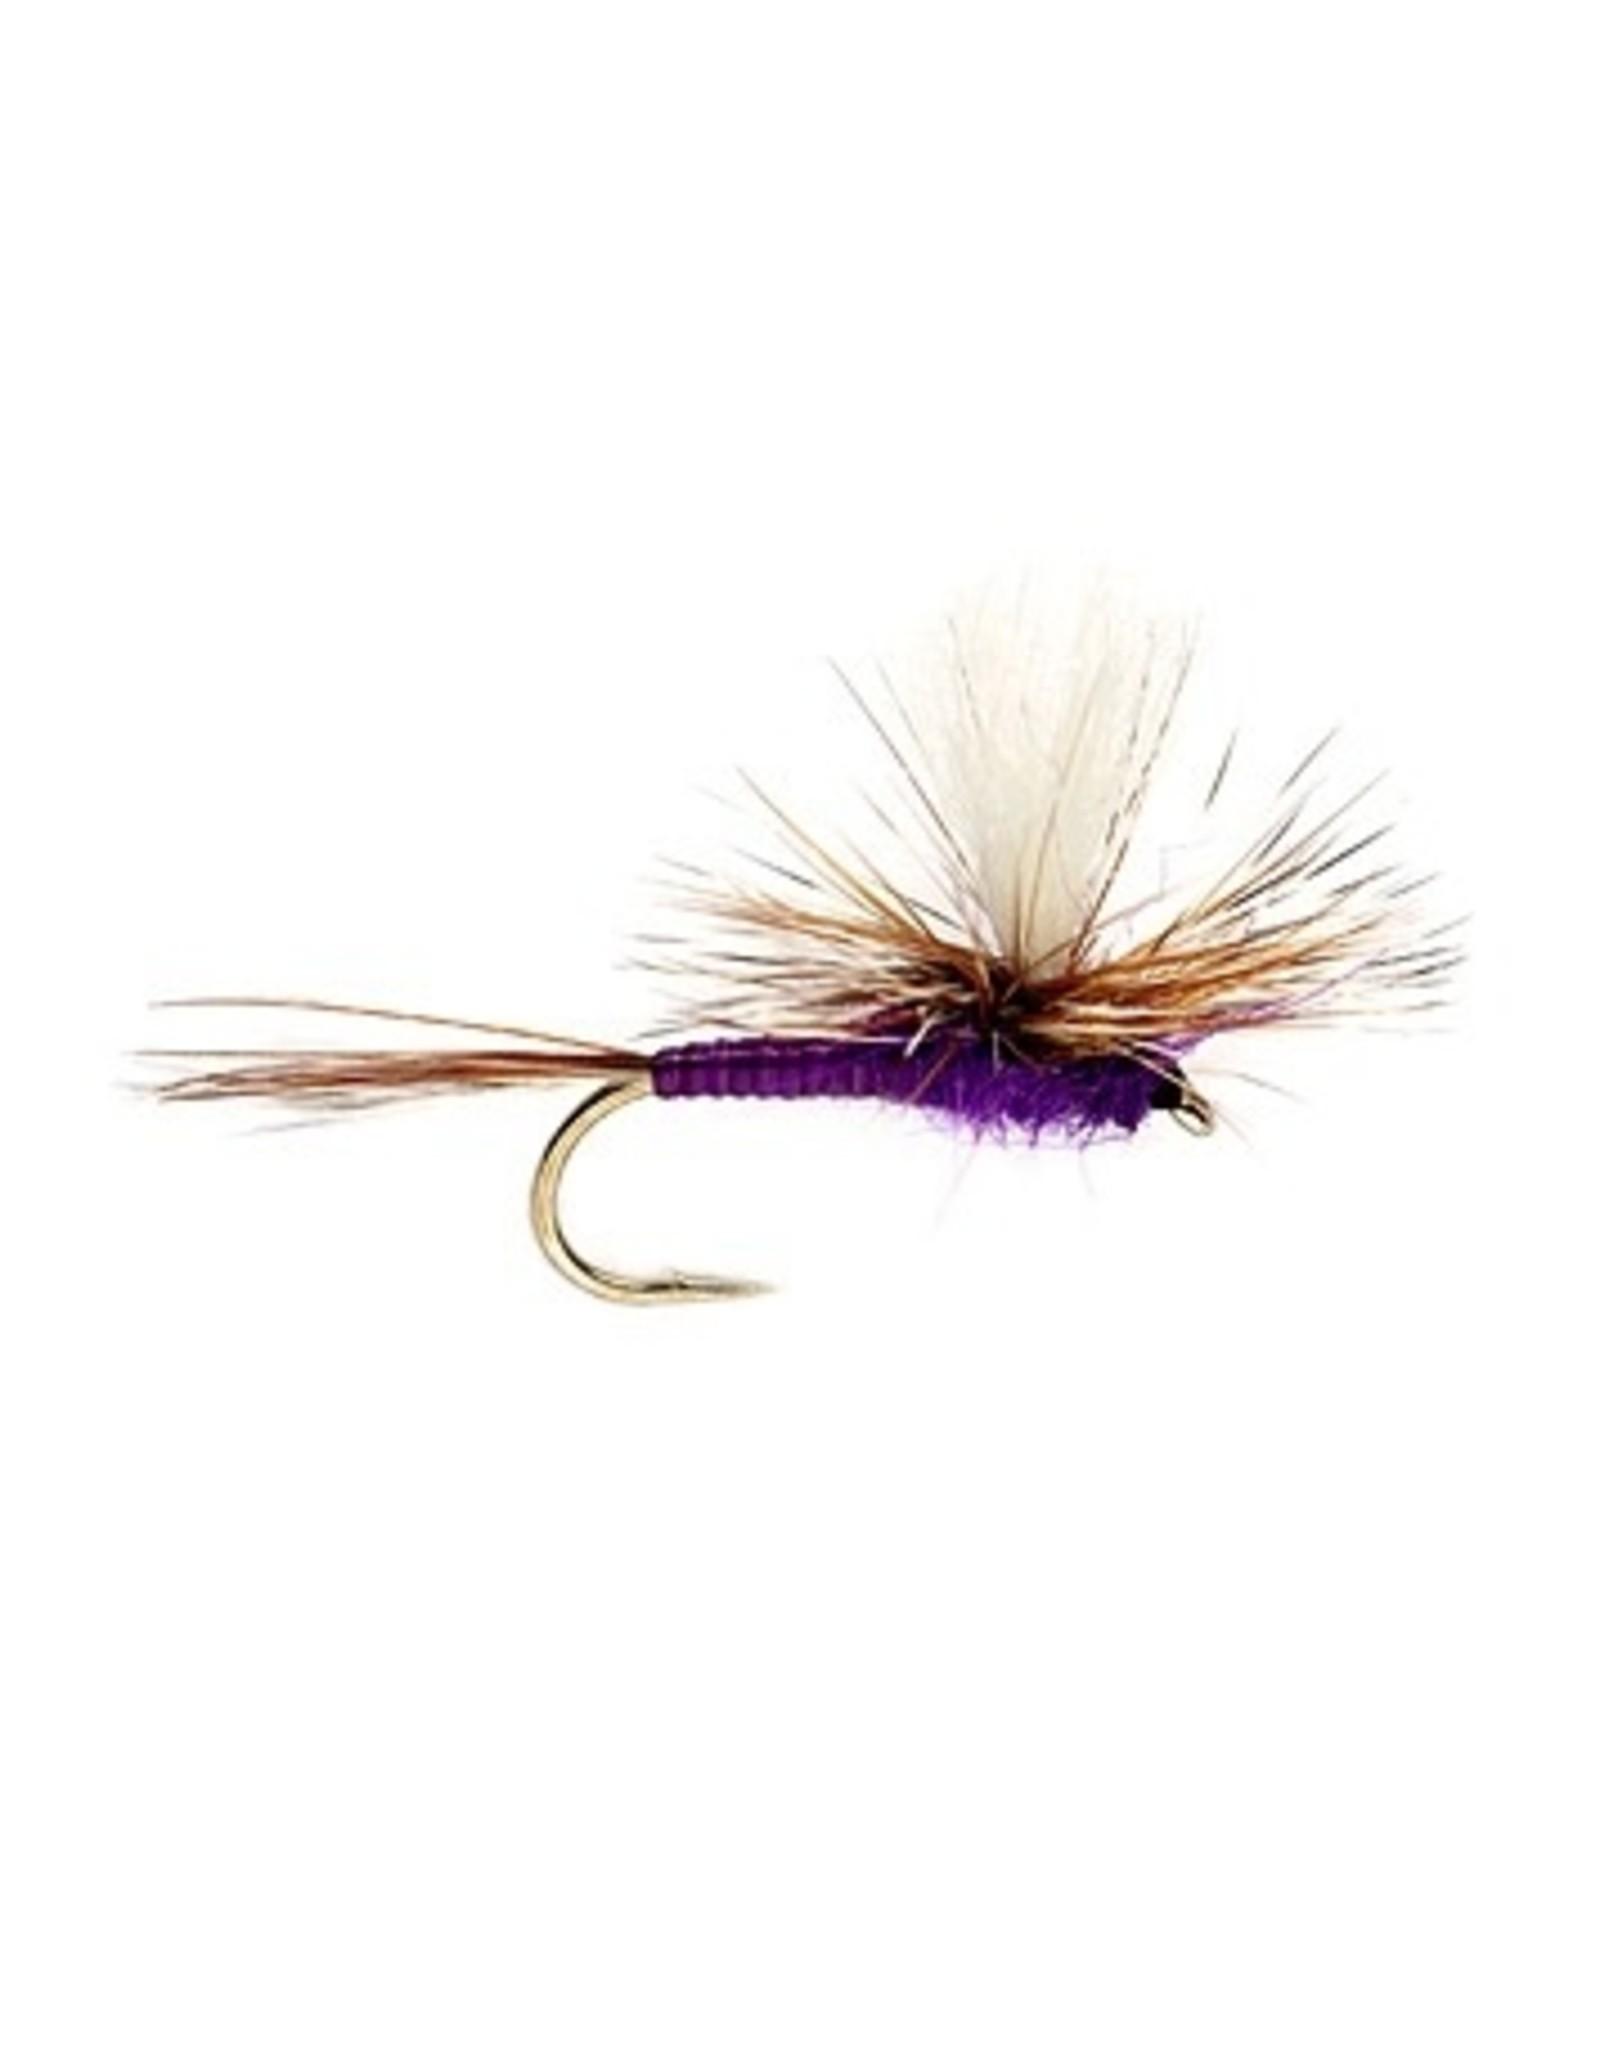 Umpqua Parachute Adams (3 Pack)